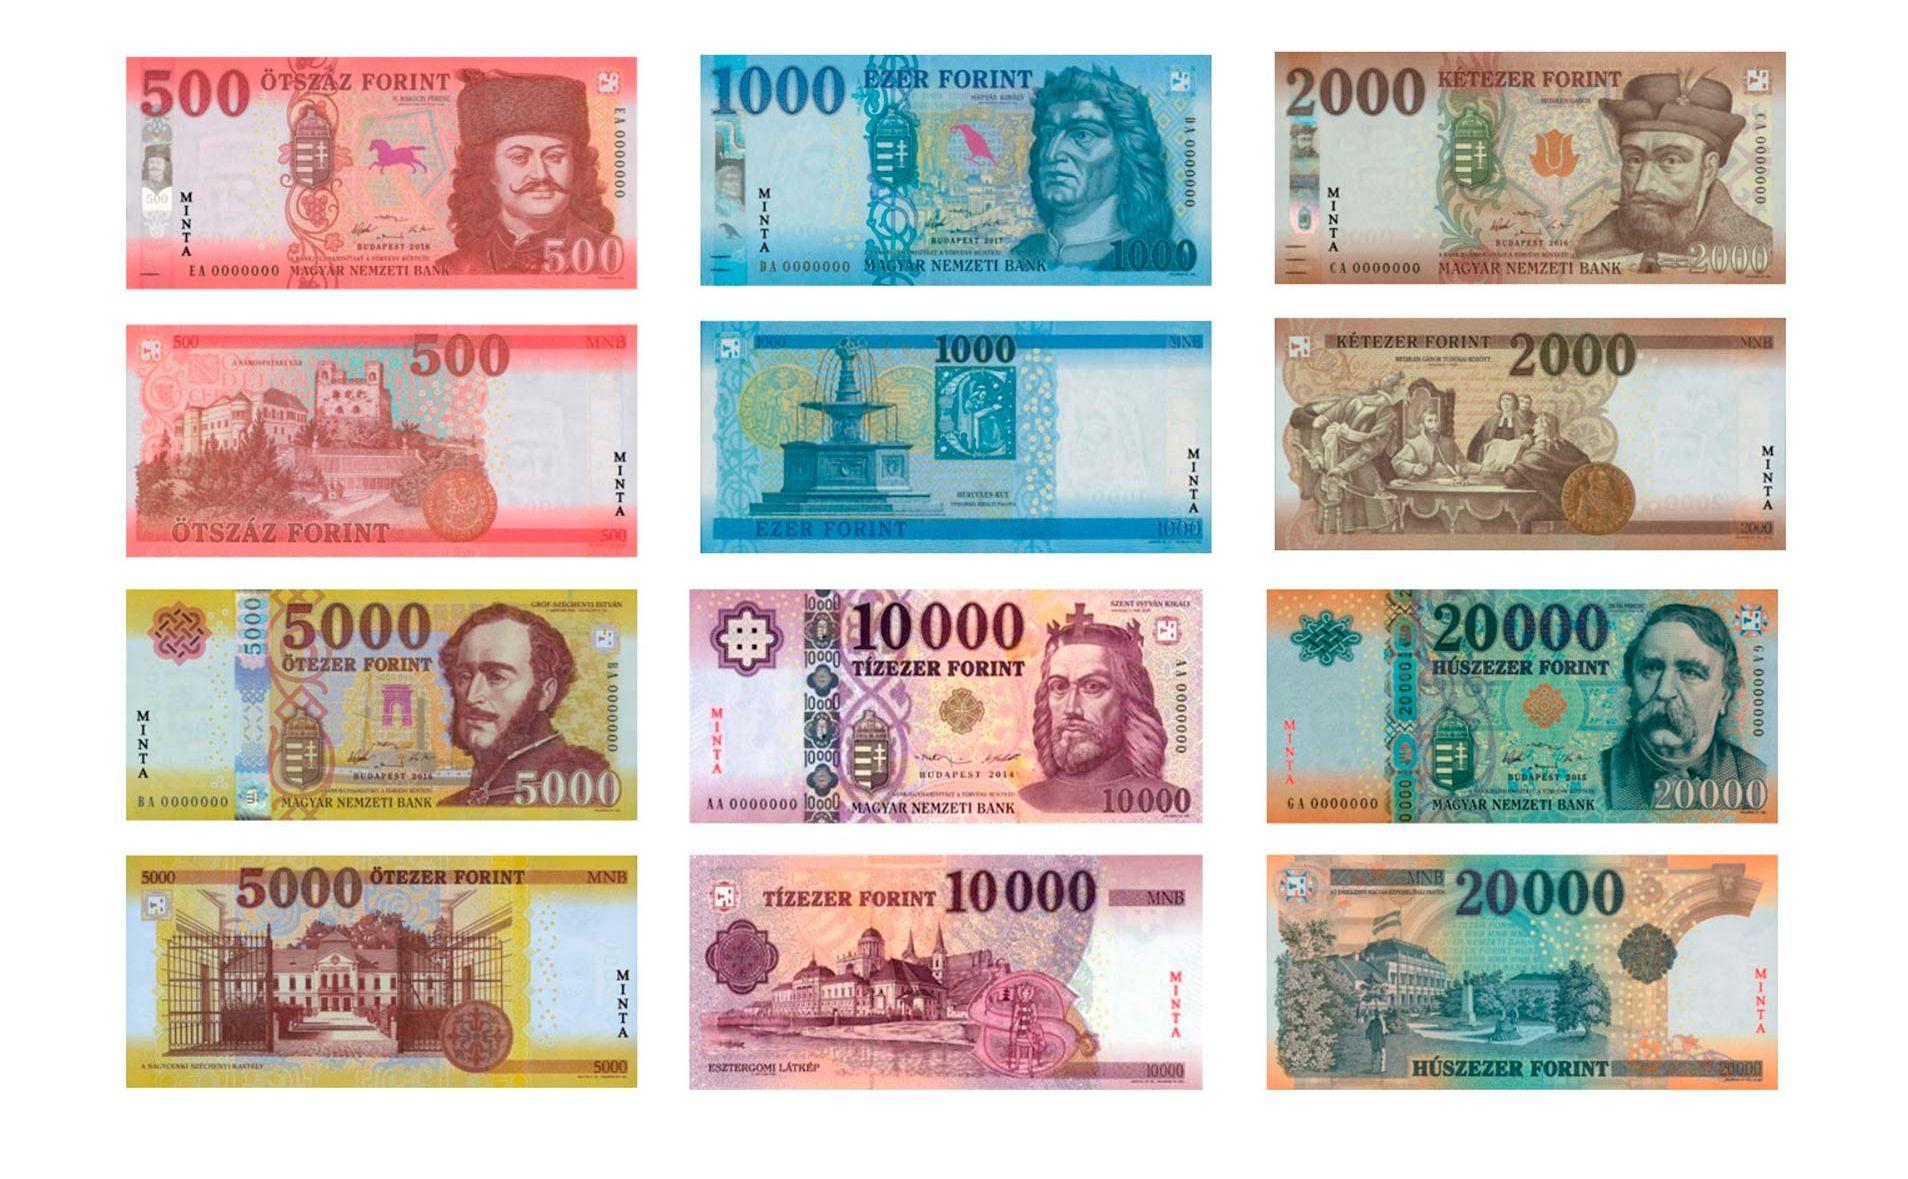 Hungarian Forint Bank Notes - שטרות חדשים פורינט הונגרי המרת כסף בבודפשט